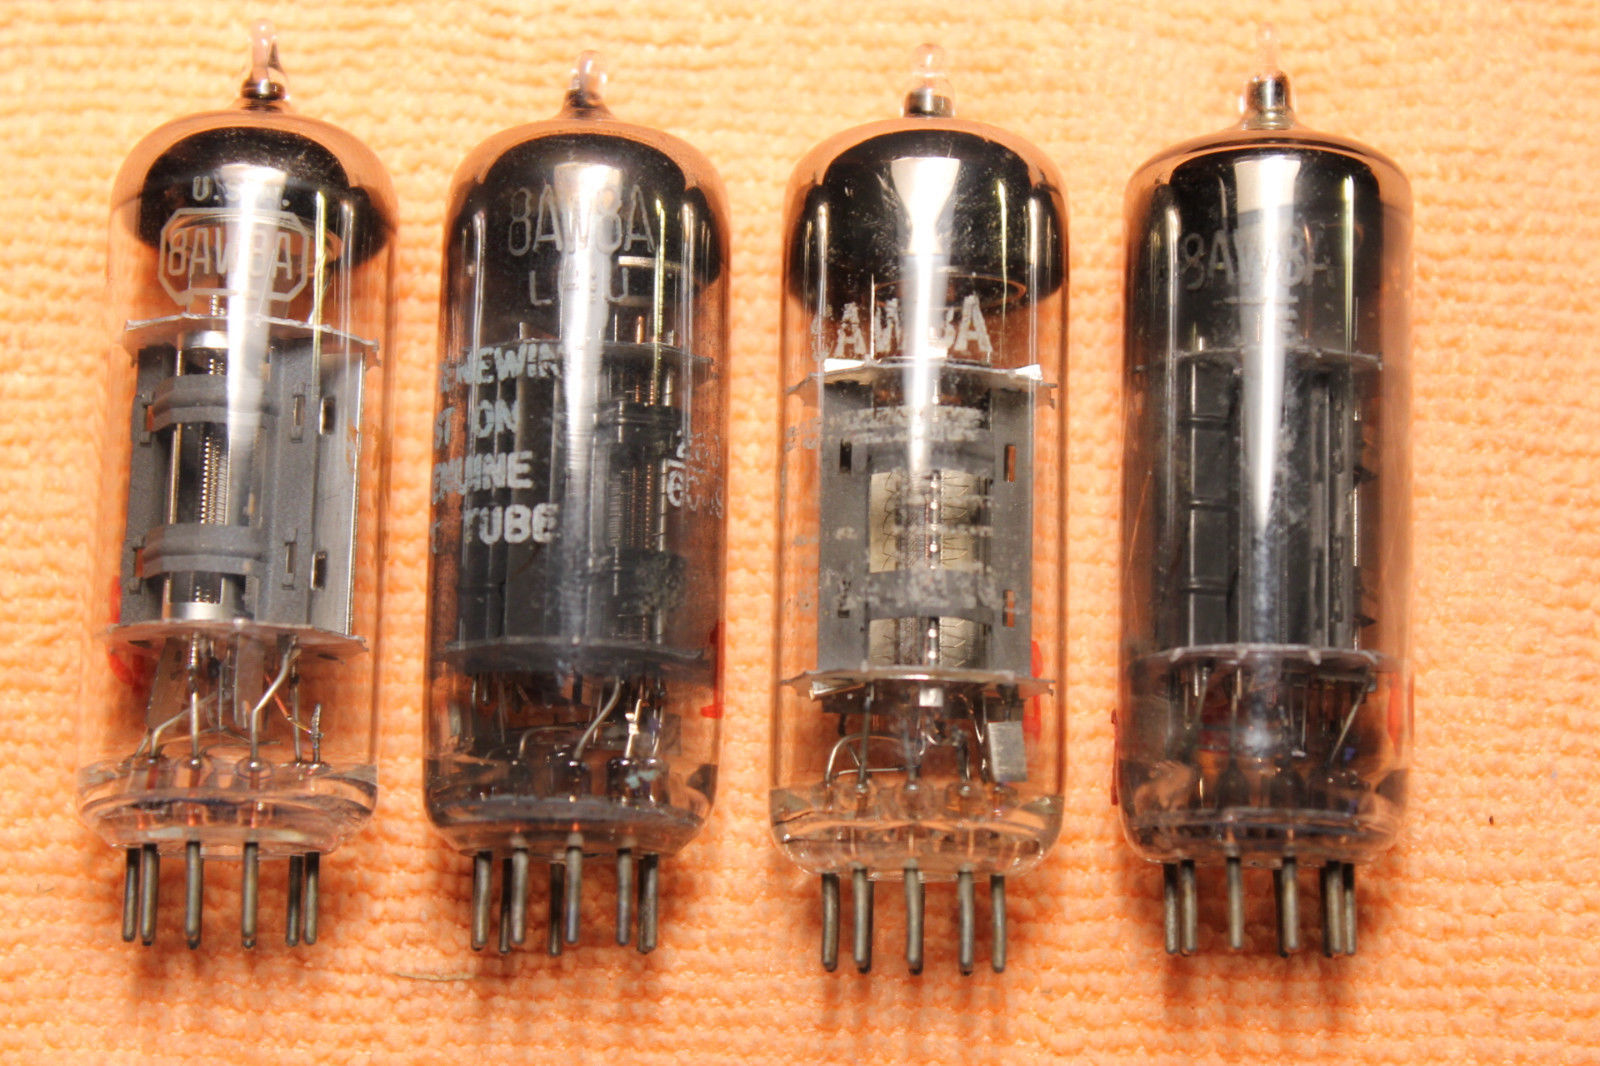 Vintage Radio Vacuum Tube (one): 8AW8A - Tested Good